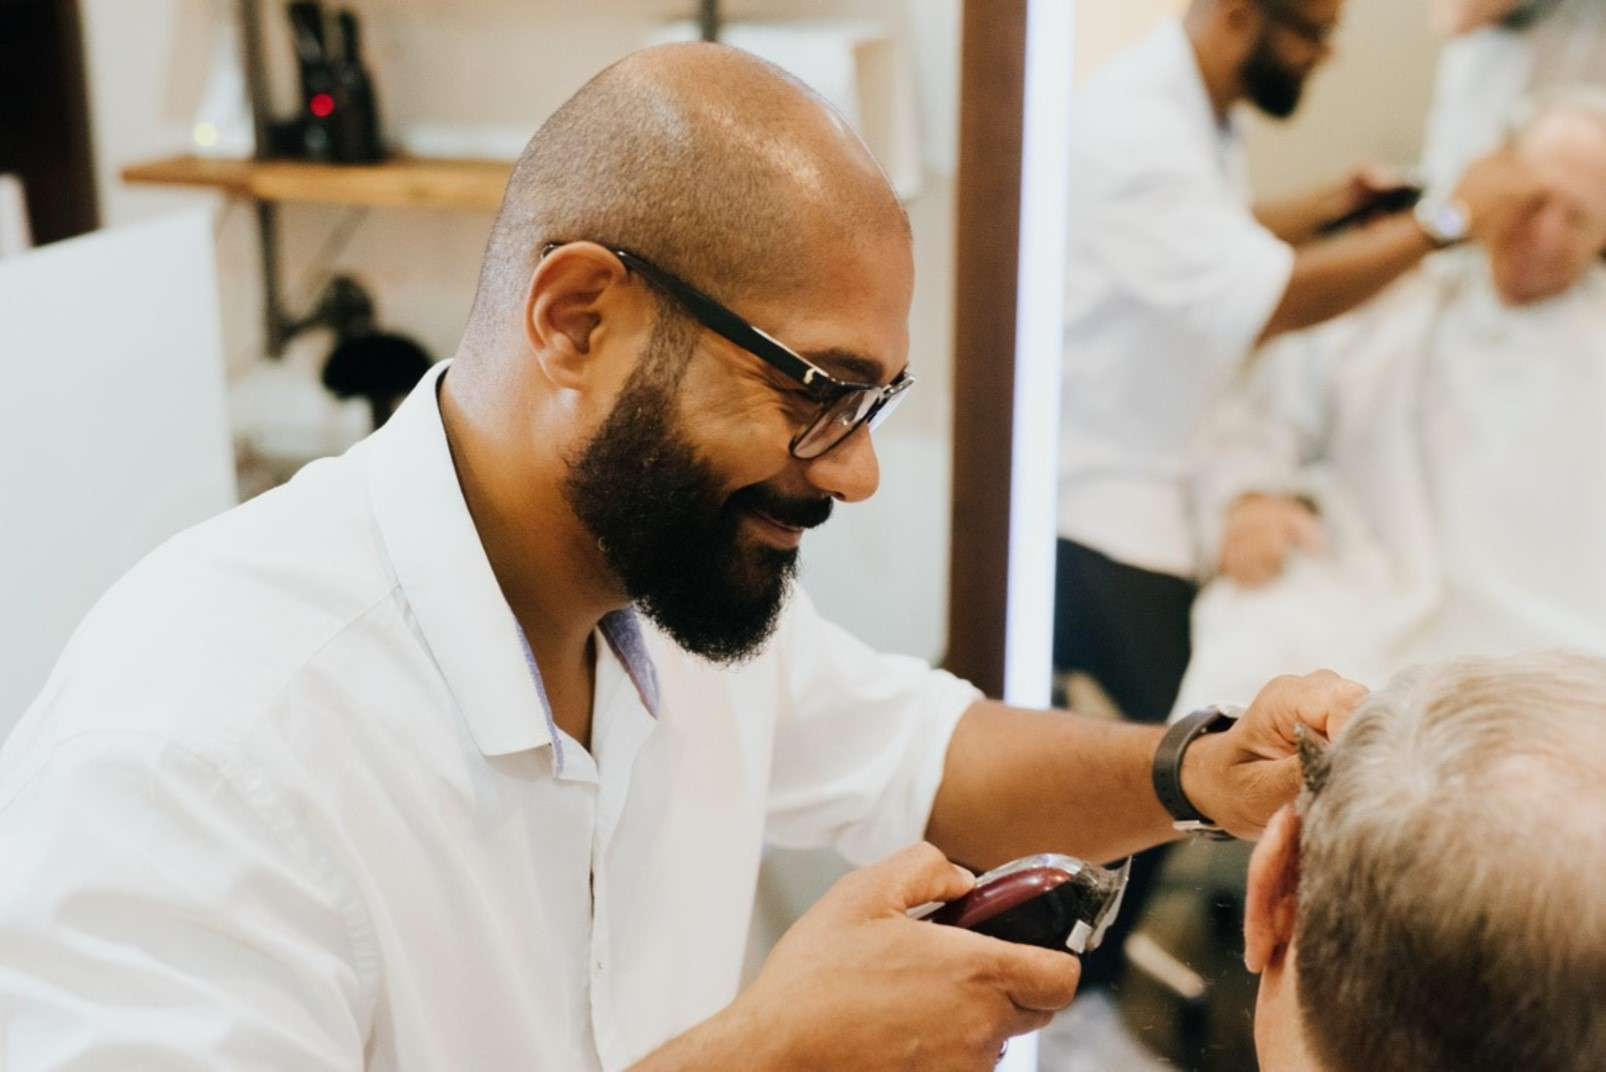 Eric:Barbier Haircut & Shave Hamburg barber